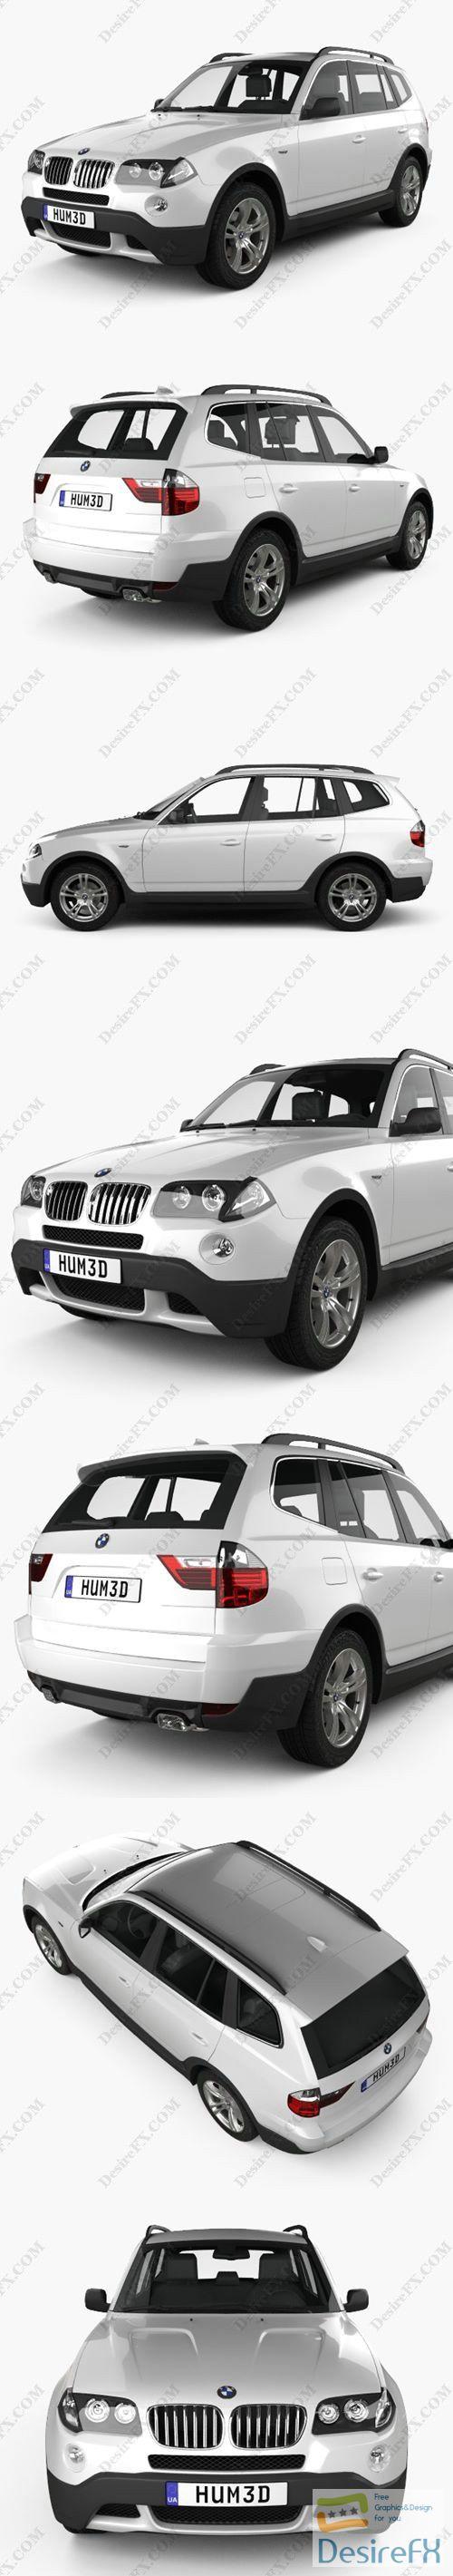 BMW X3 2003 3D Model